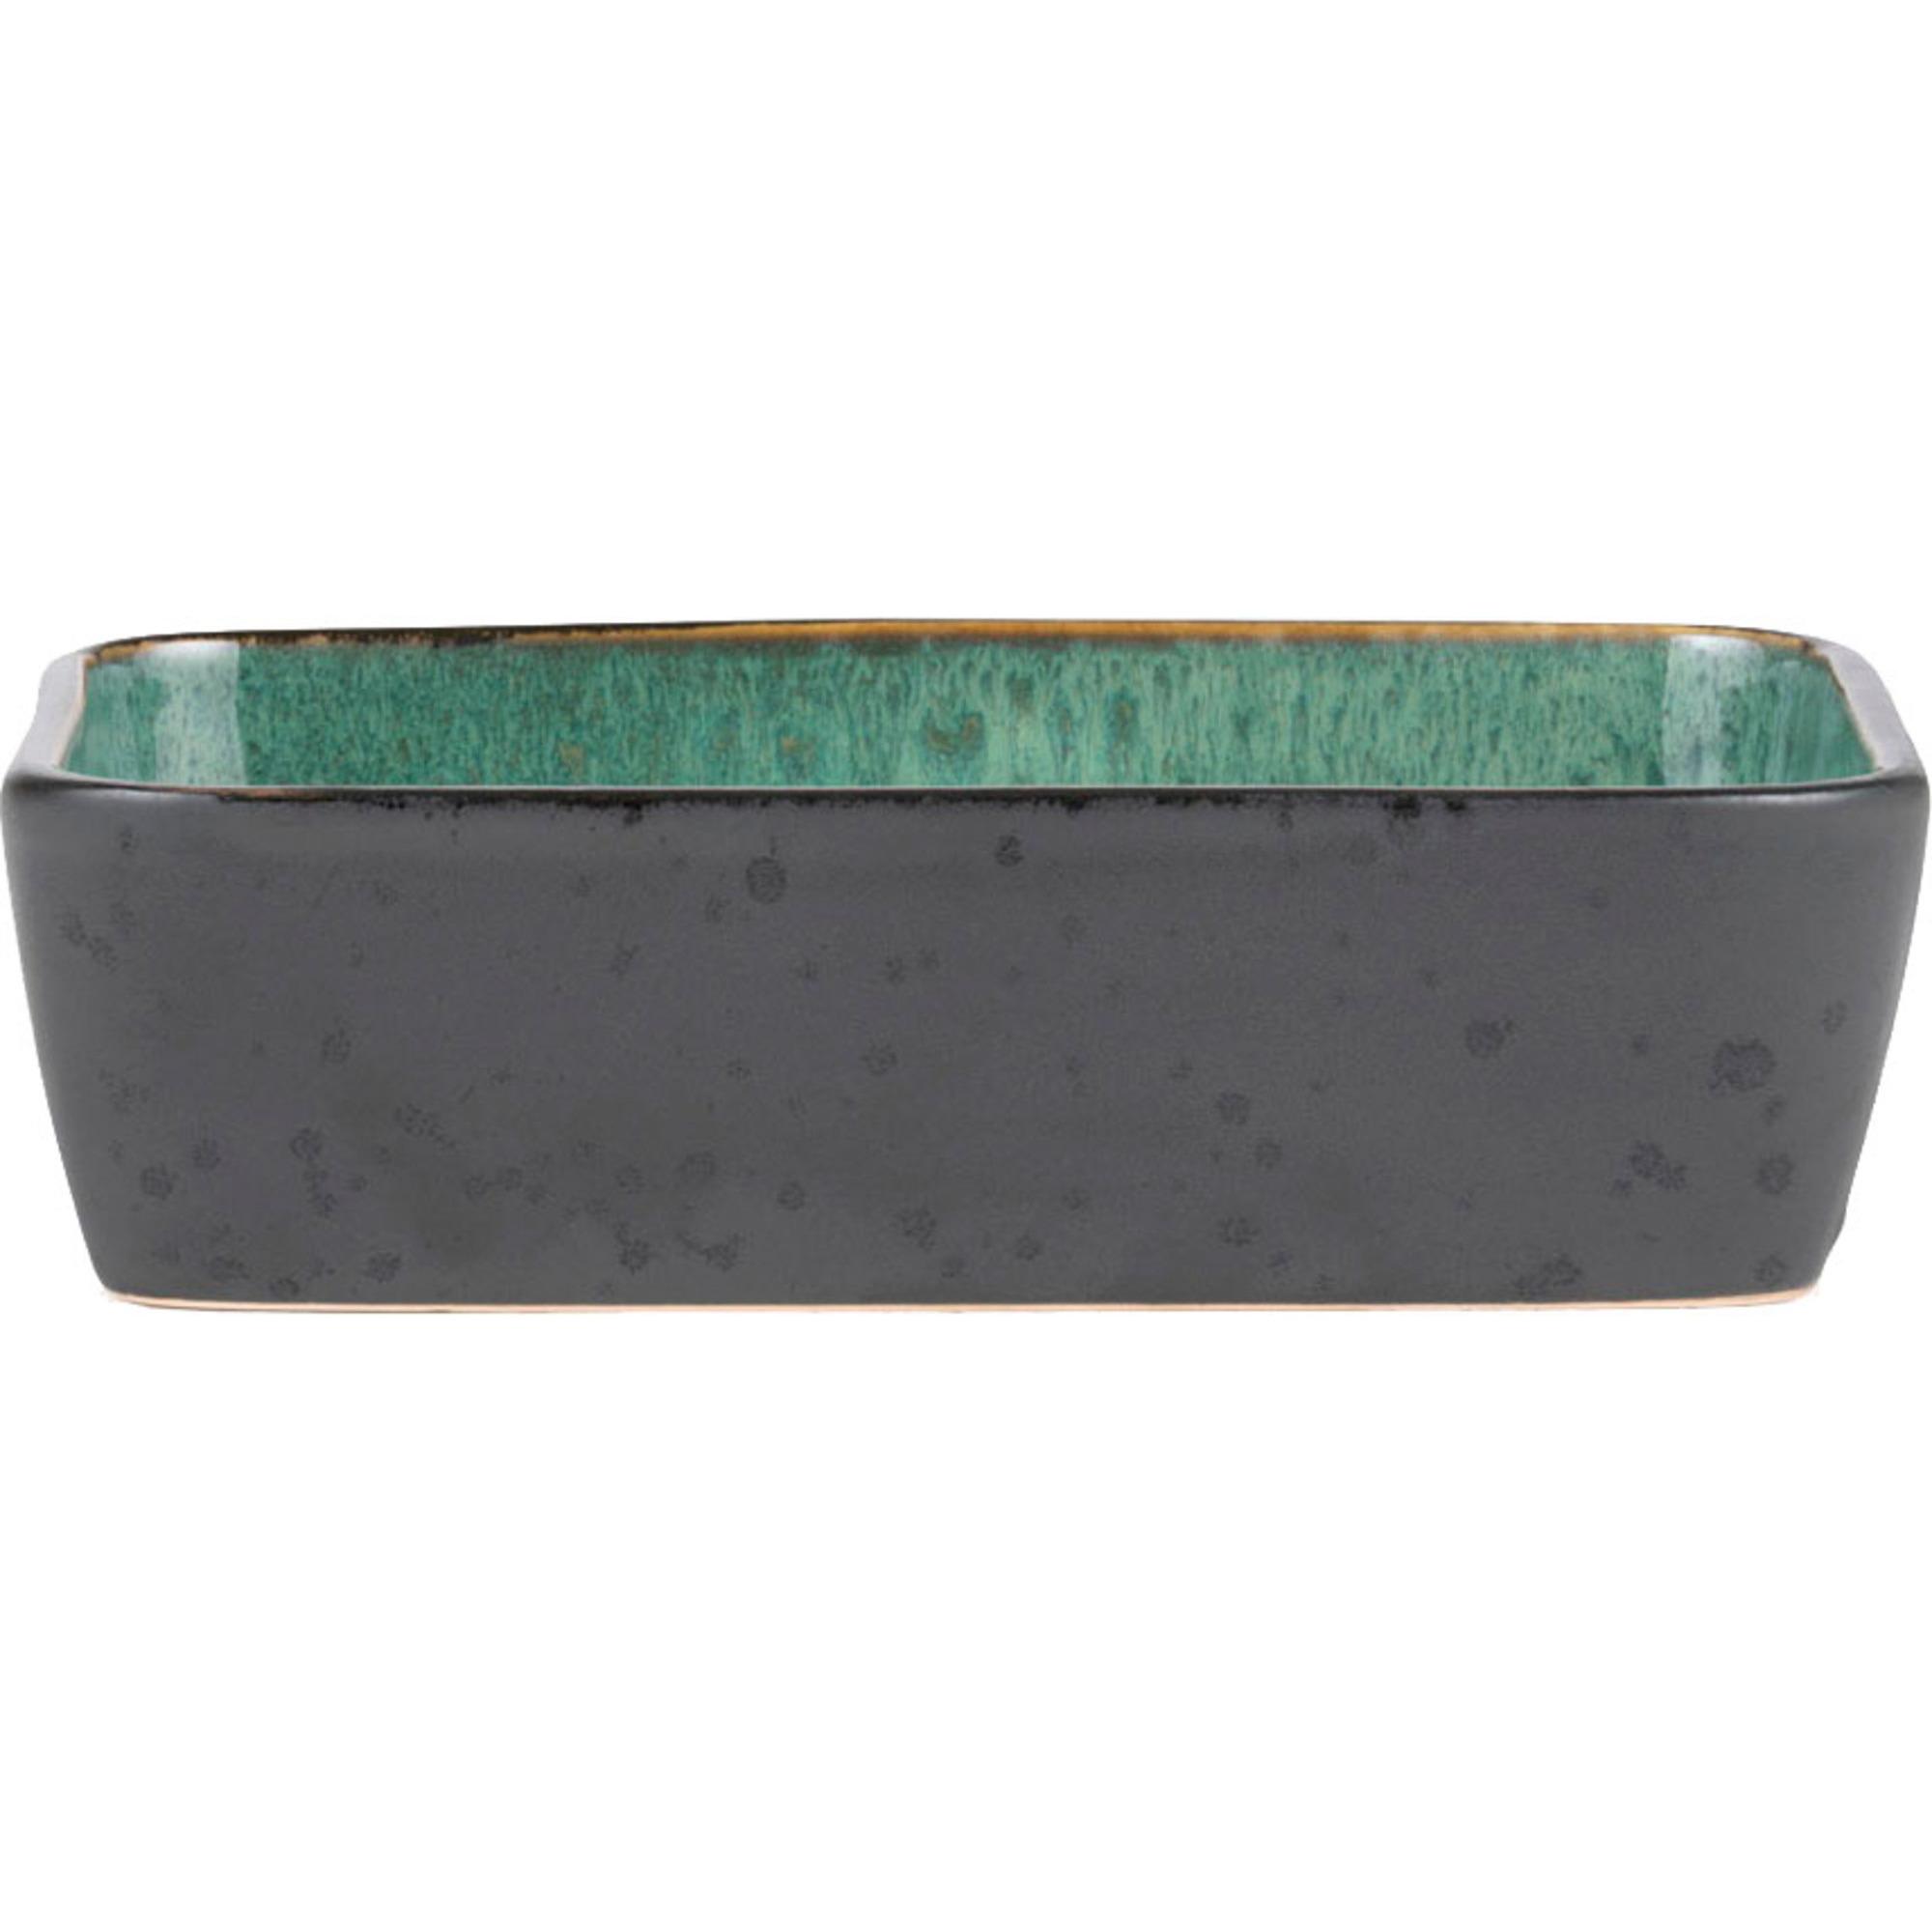 Bitz Fat rekt. 30x17cm svart/grön